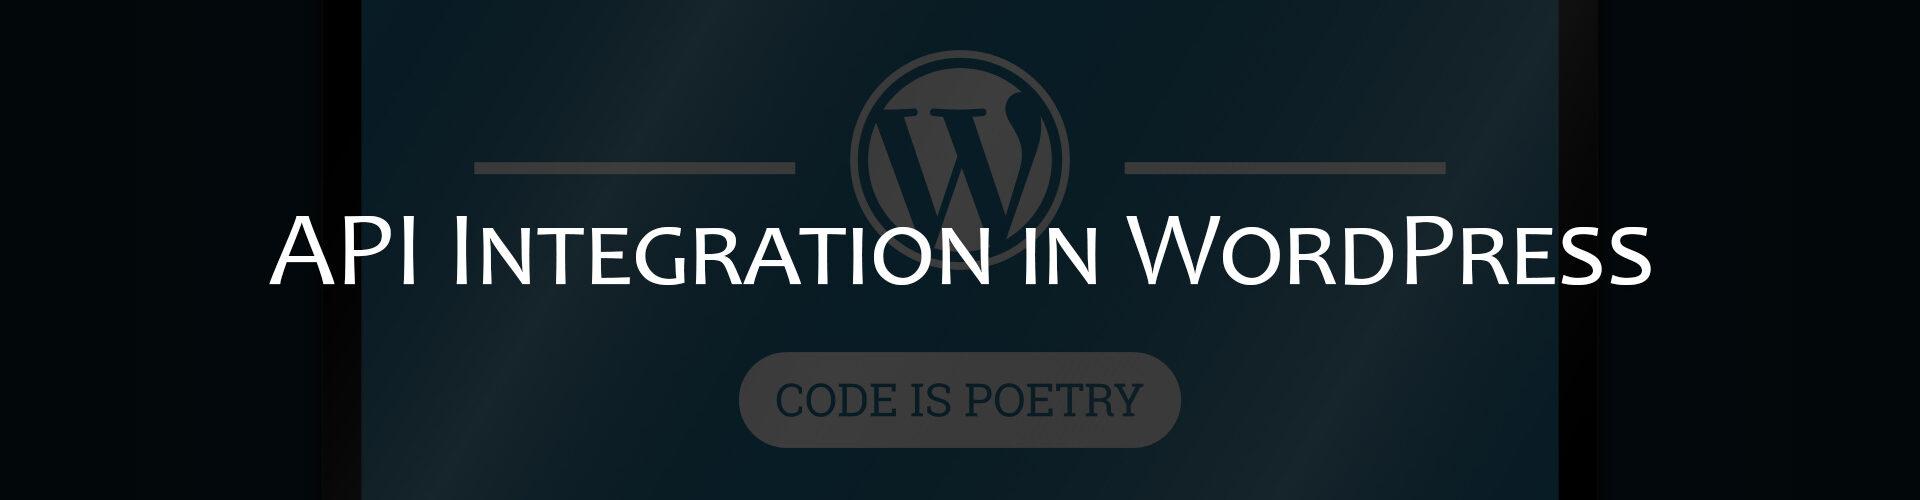 API Integration in WordPress